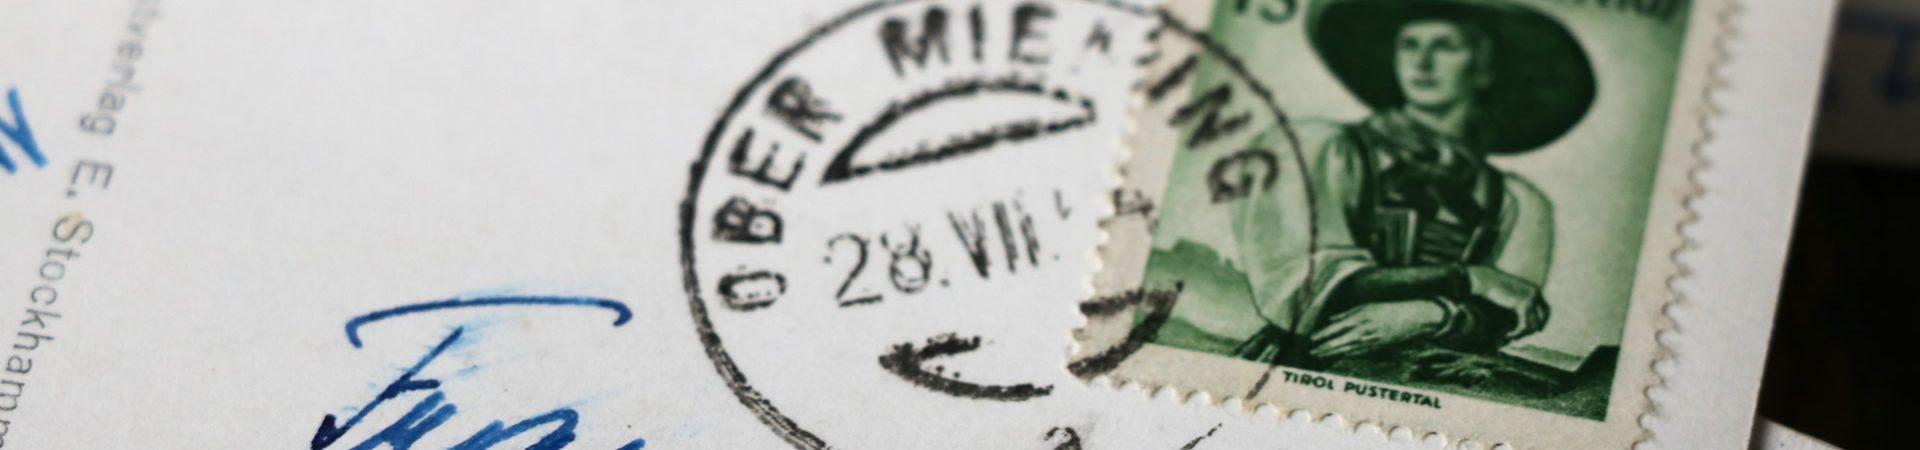 Kontakt - Historische Postkarte aus Mieming. Foto: Mieming.online